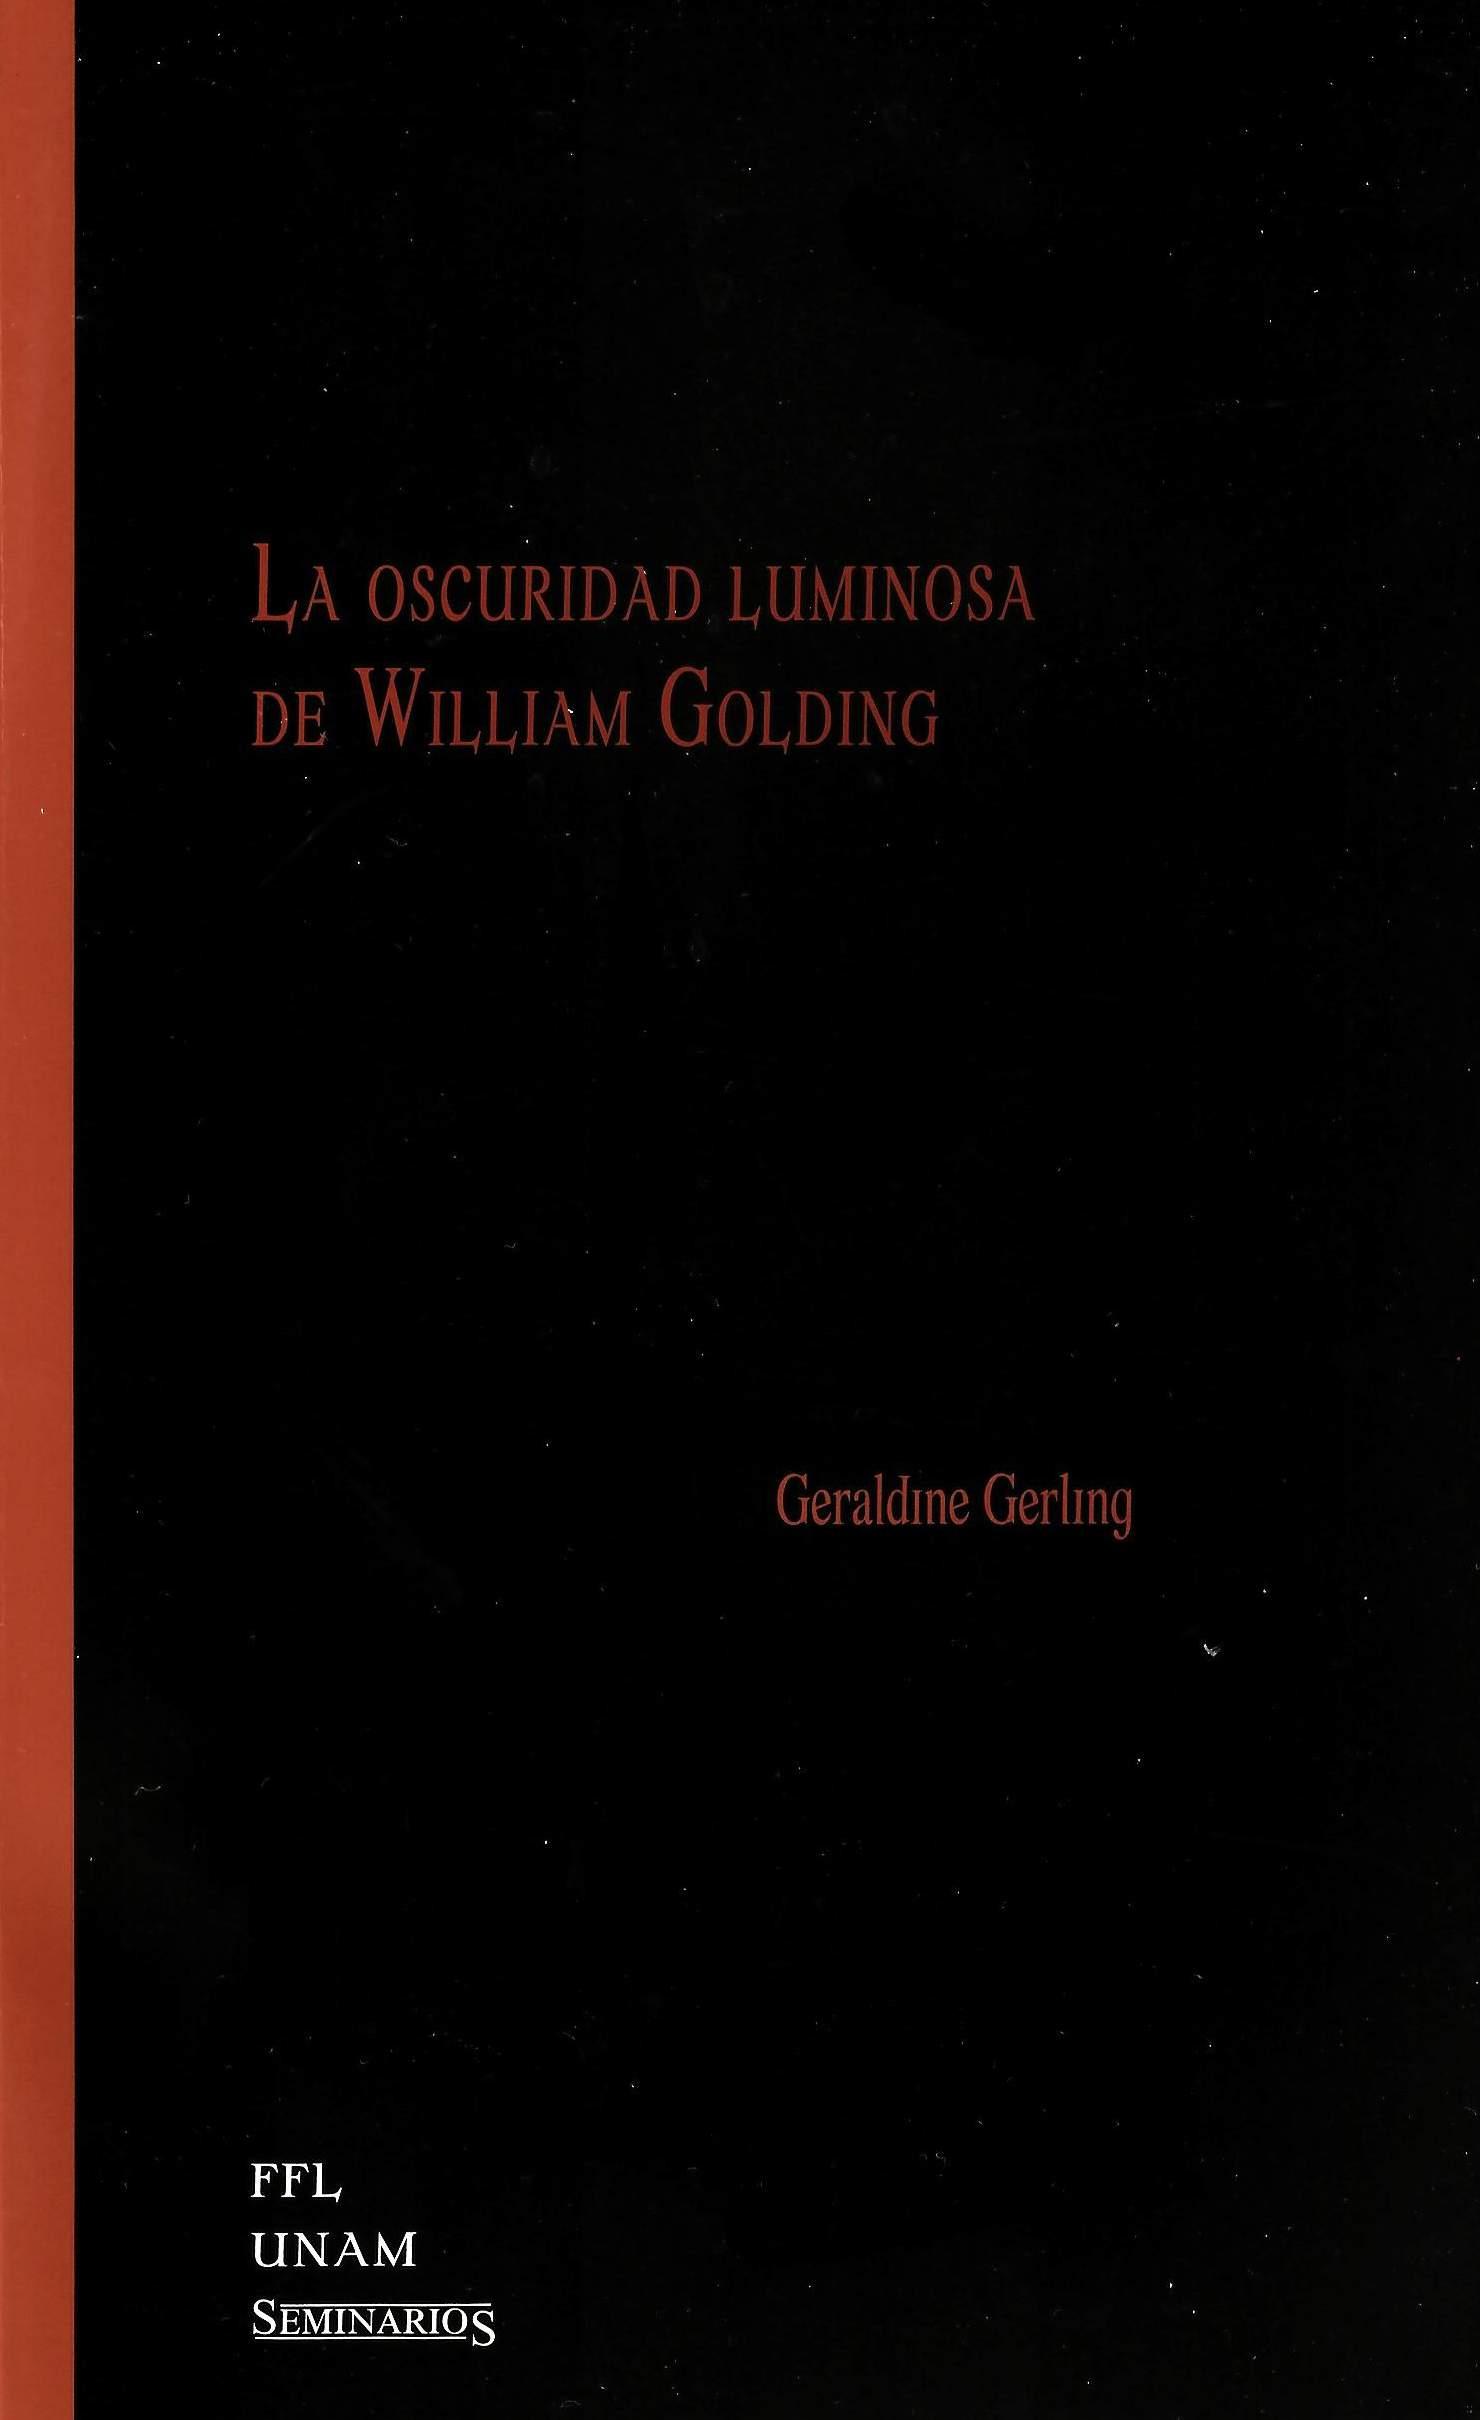 La oscuridad luminosa de William Golding